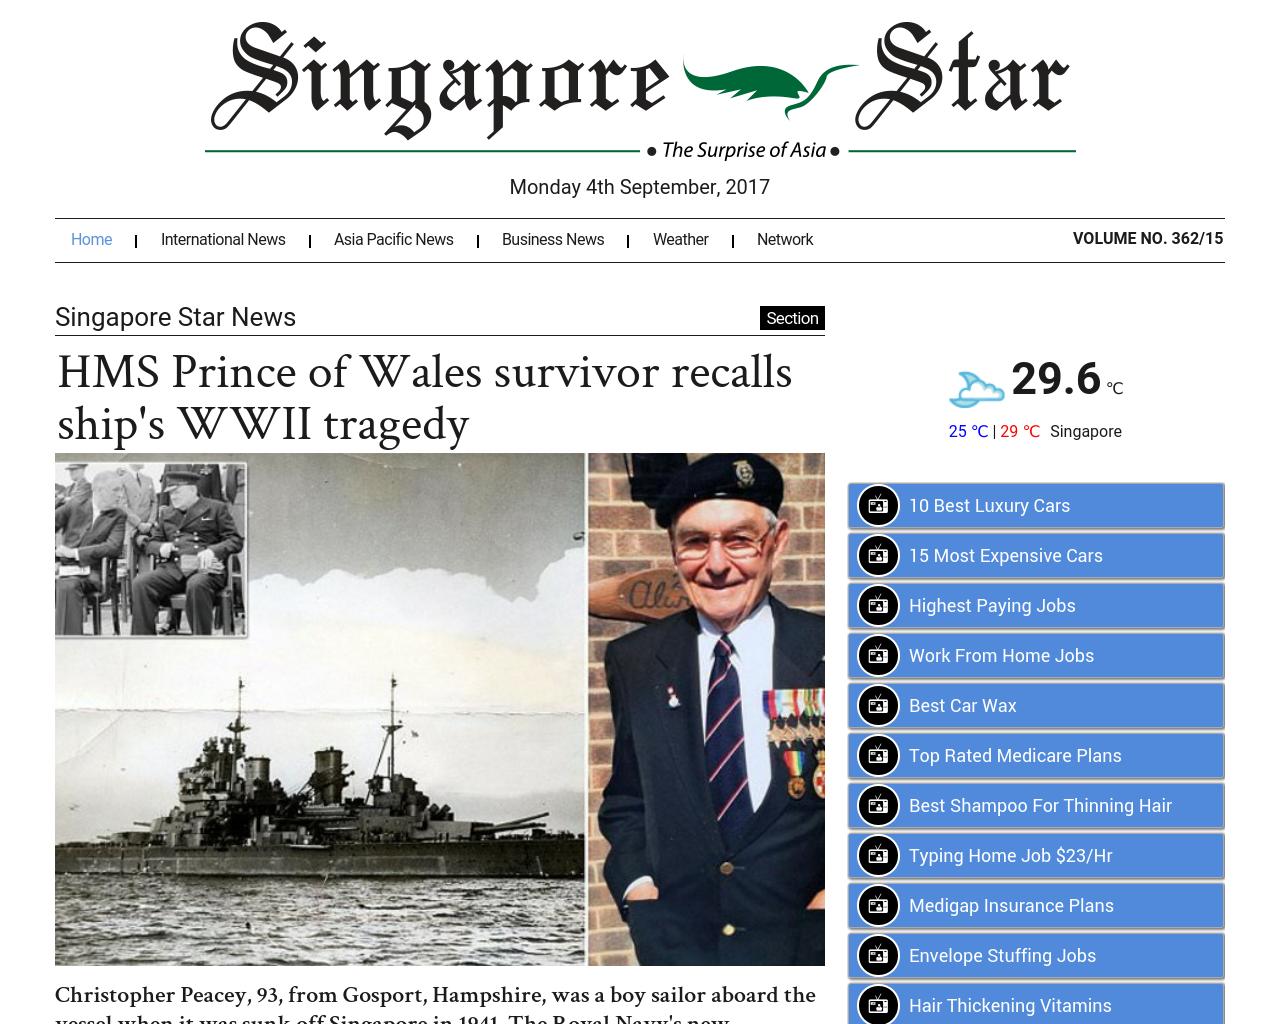 Singapore-Star-Advertising-Reviews-Pricing